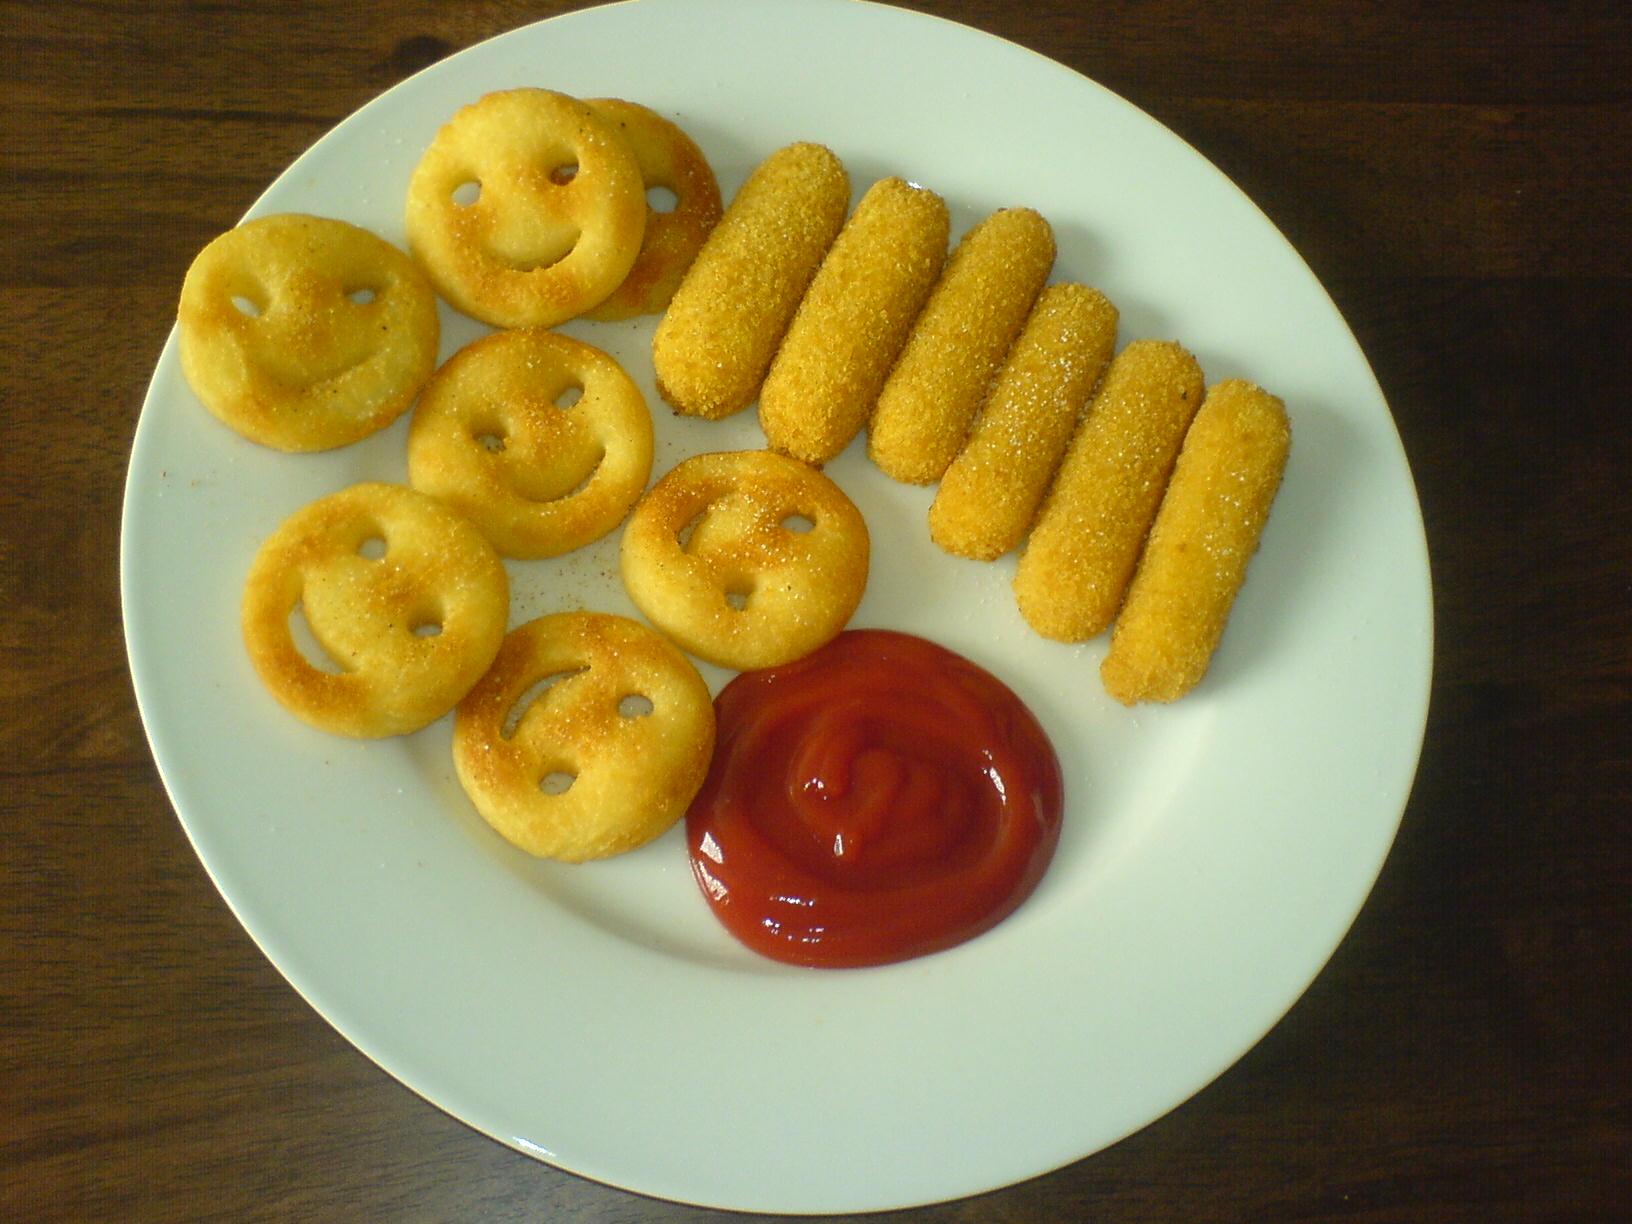 https://foodloader.net/Holz_2011-06-30_Frischkaesesticks_mit_Smiles.jpg